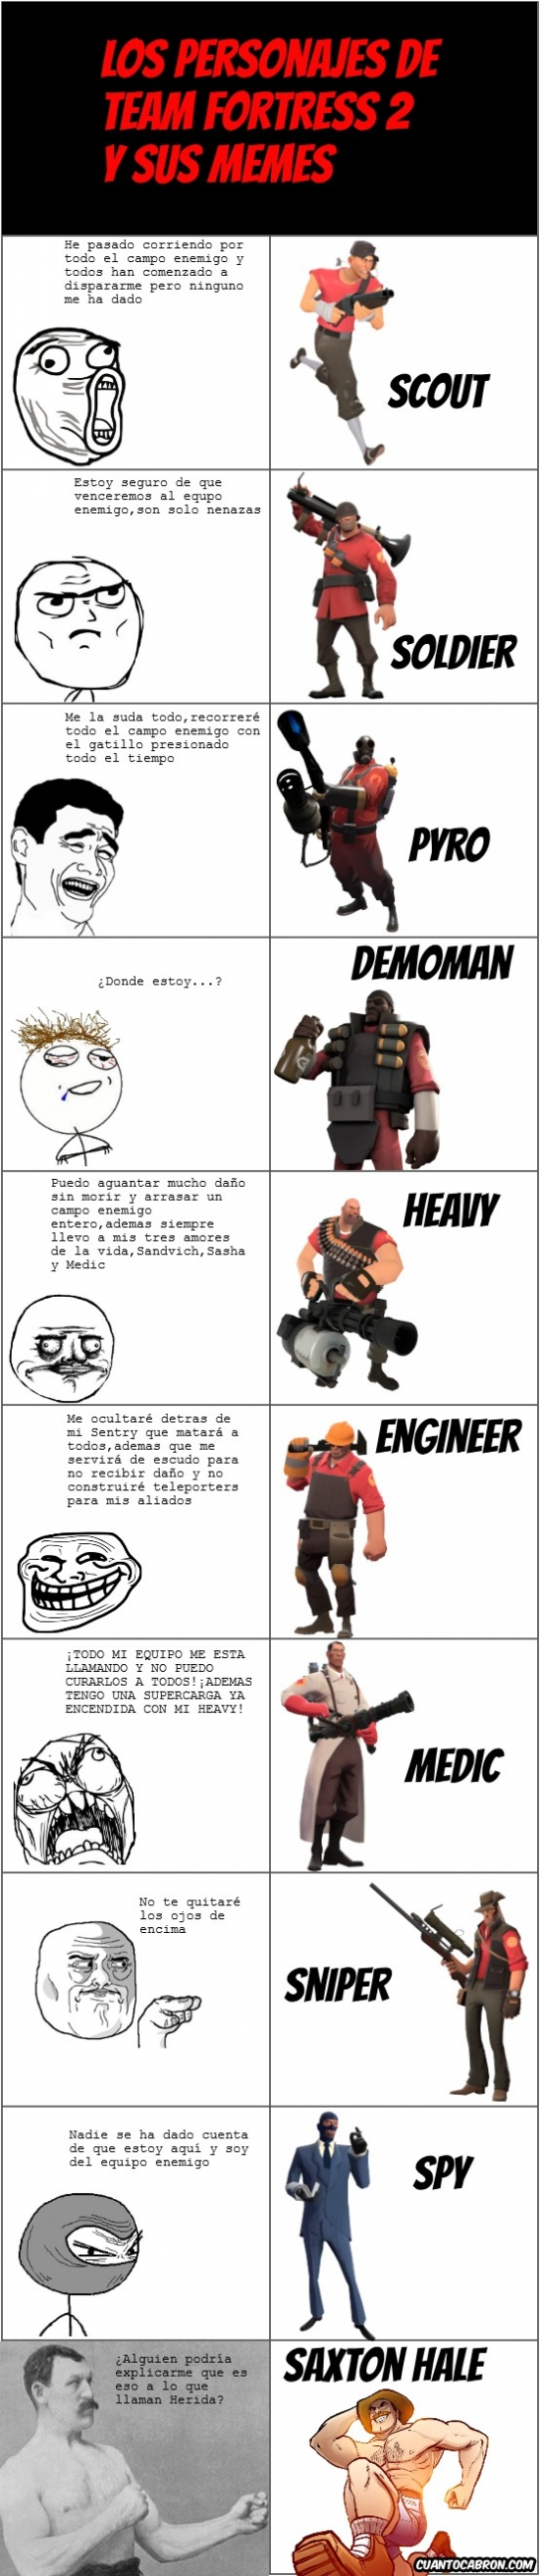 Mix - Los personajes de Team Fortress 2 y sus memes